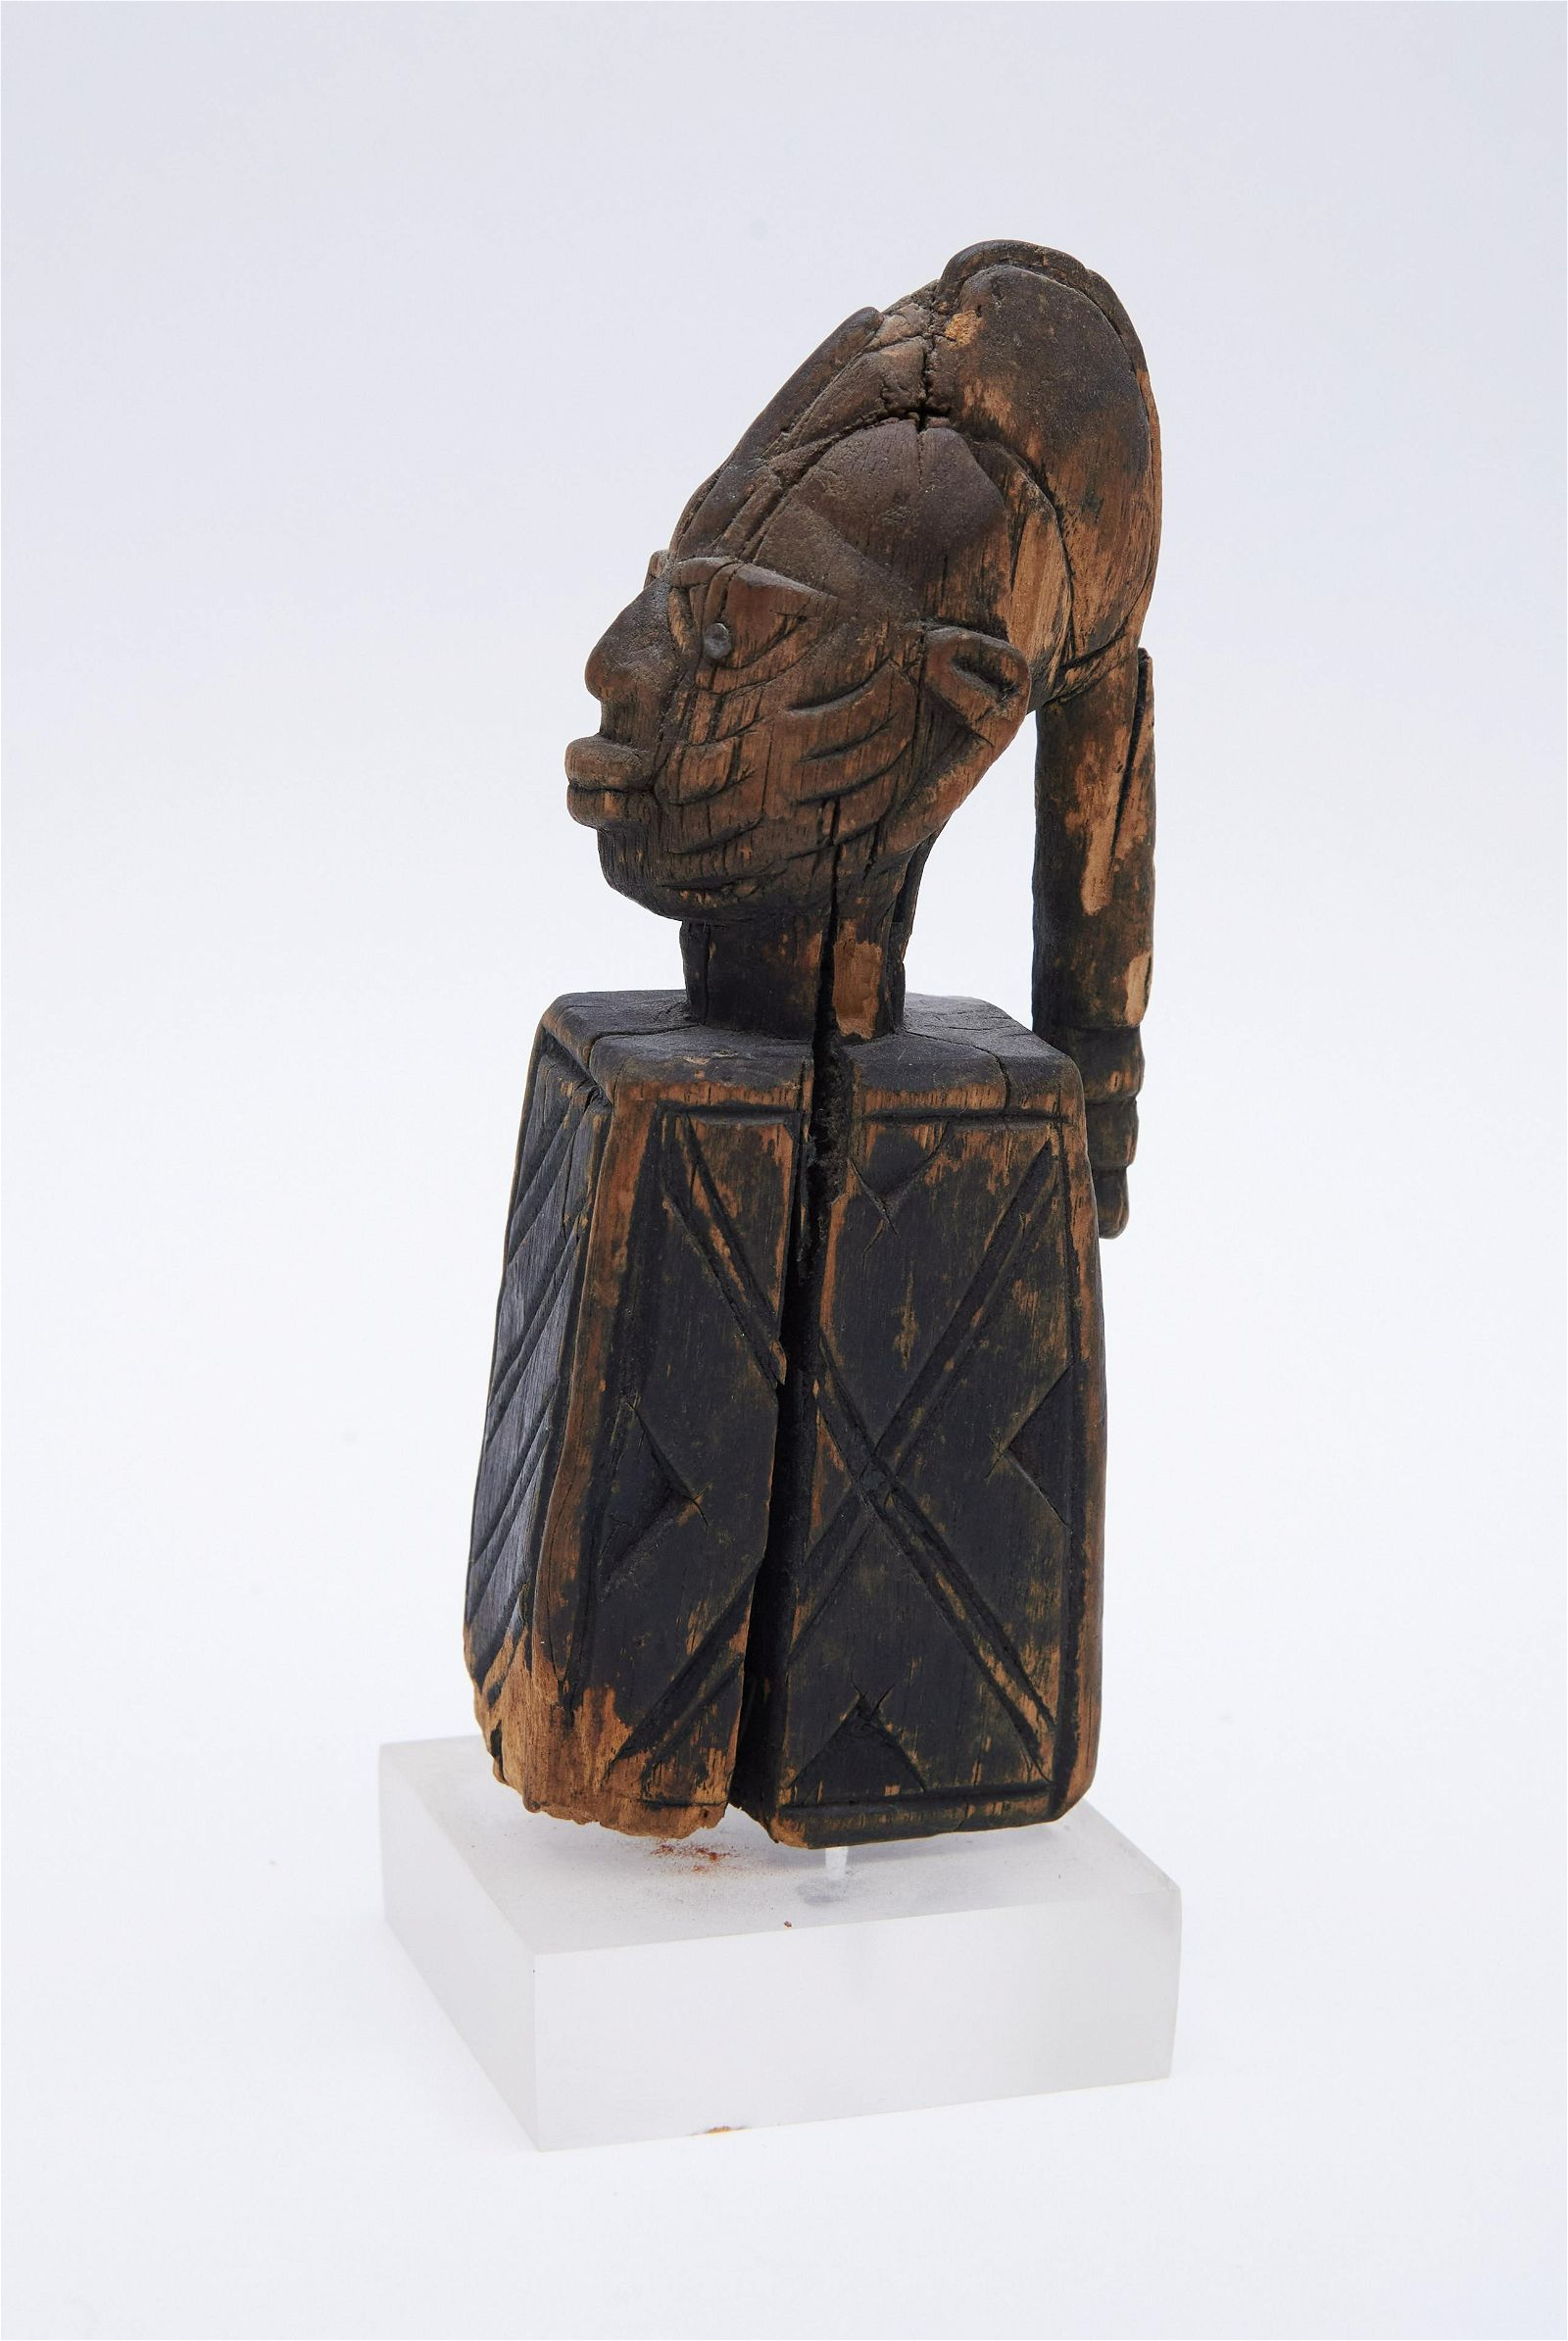 Yoruba Eshu African Staff Height: 6 1/2 inches